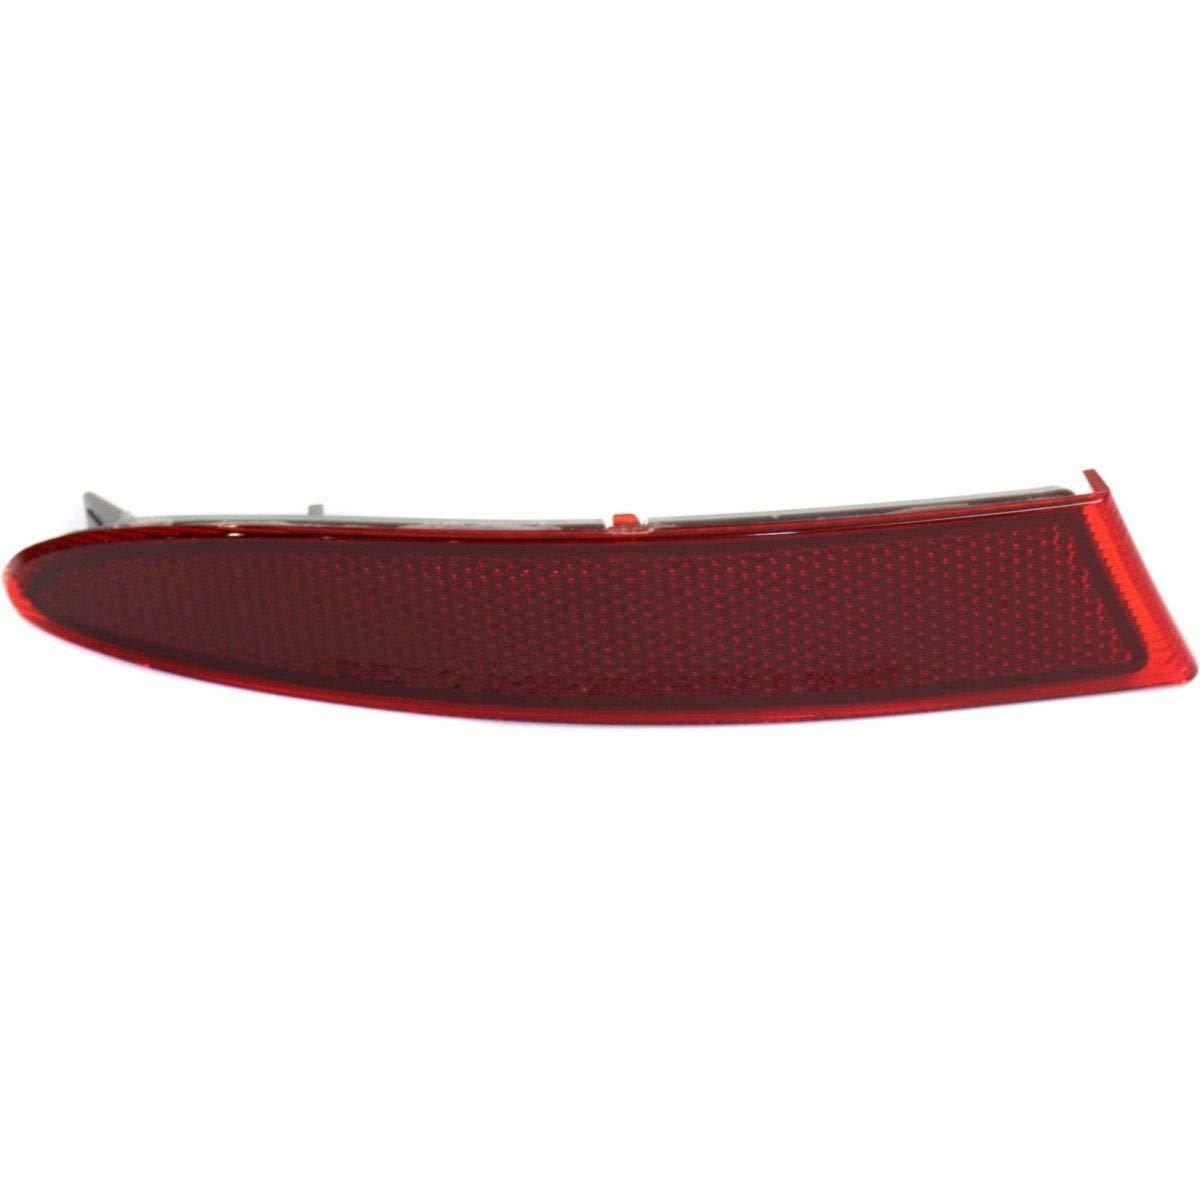 New Rear Diver Side Bumper Reflector For 2011-2017 Bmw X3 BM1184104 63147217315 Fitrite Autoparts